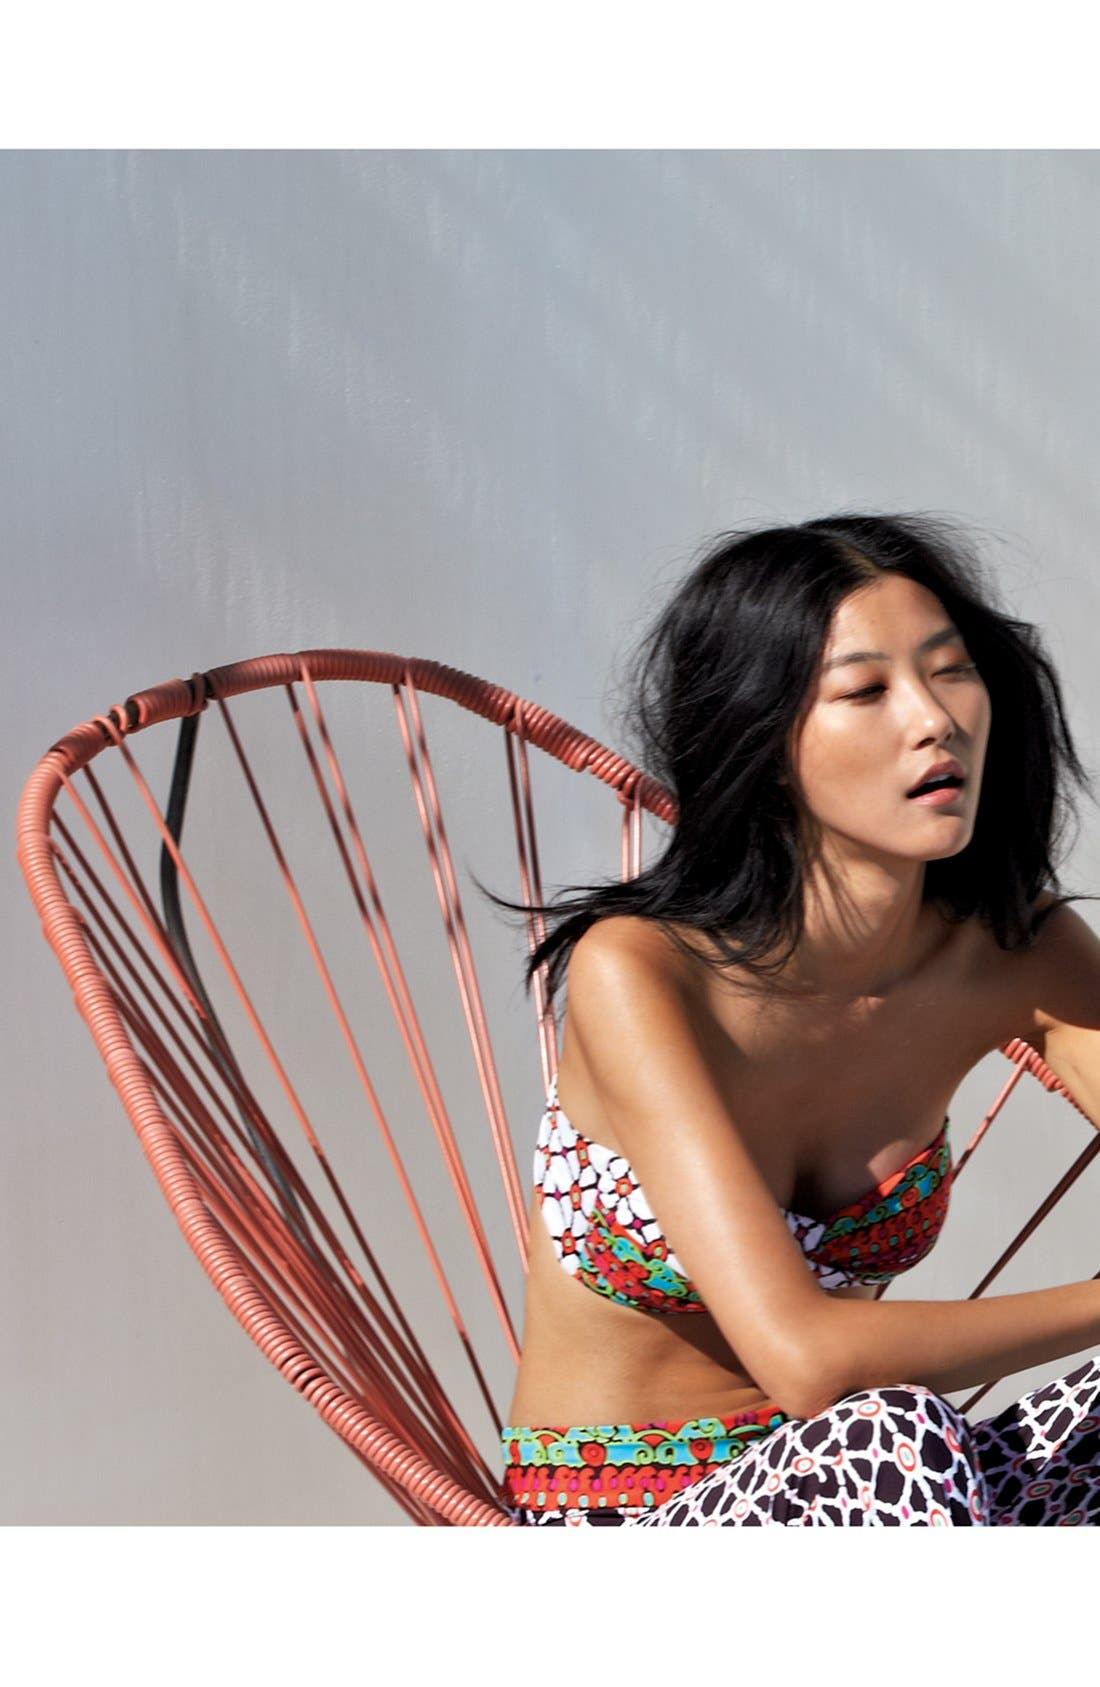 Main Image - Trina Turk Bikini Top & Bottoms